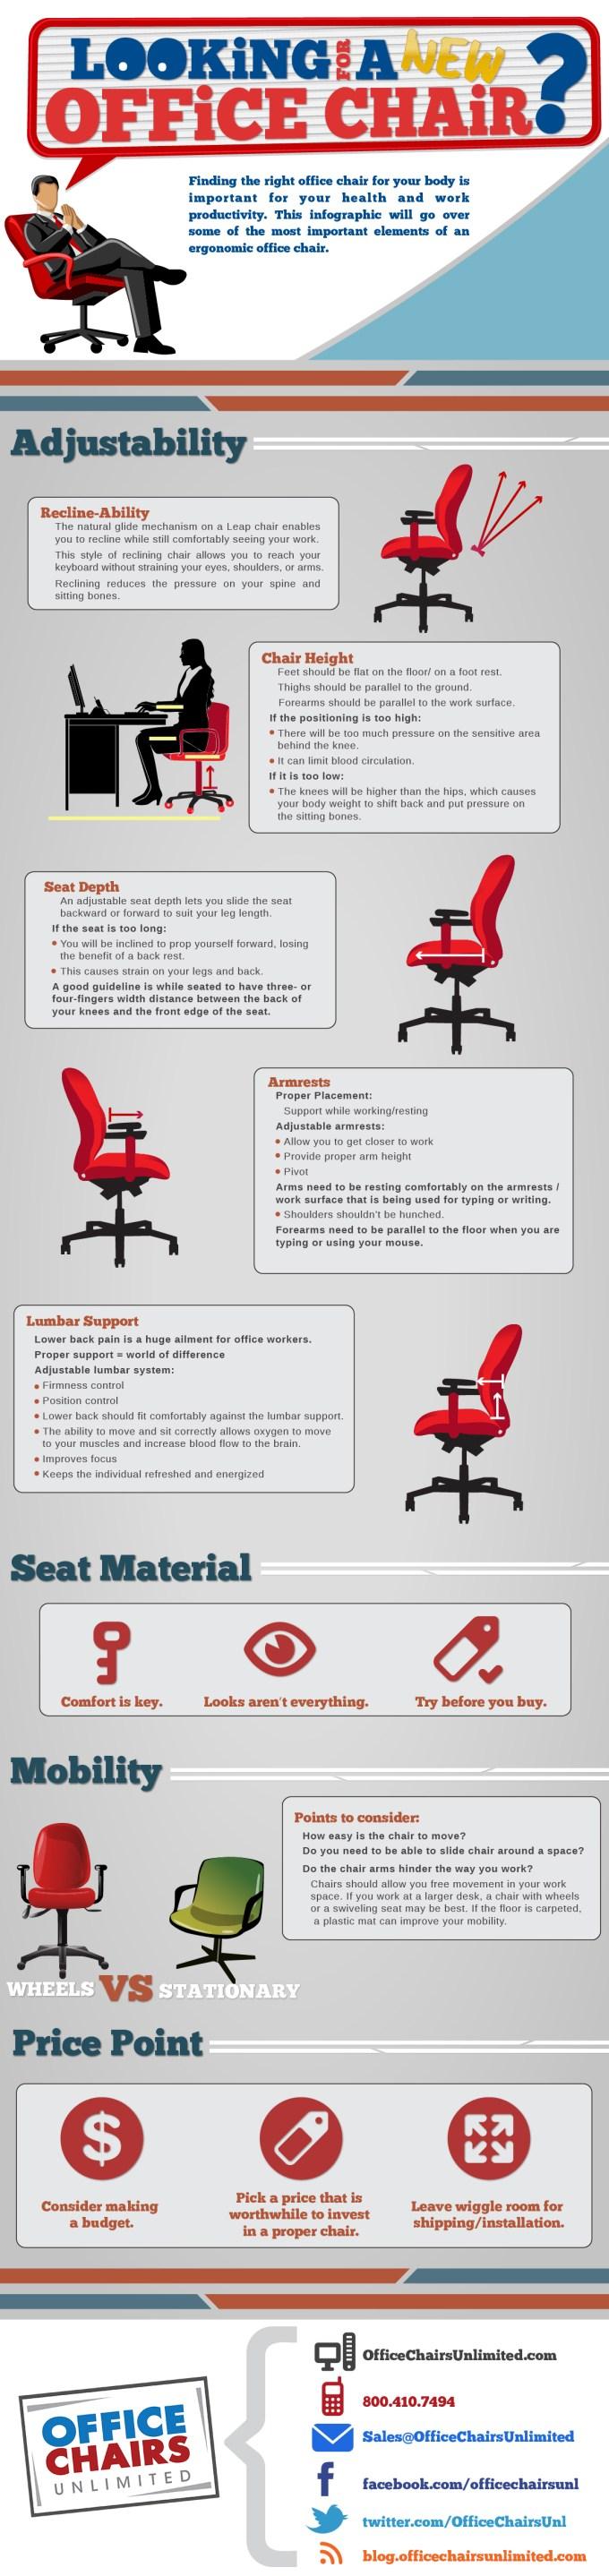 Choosing a New Office Chair